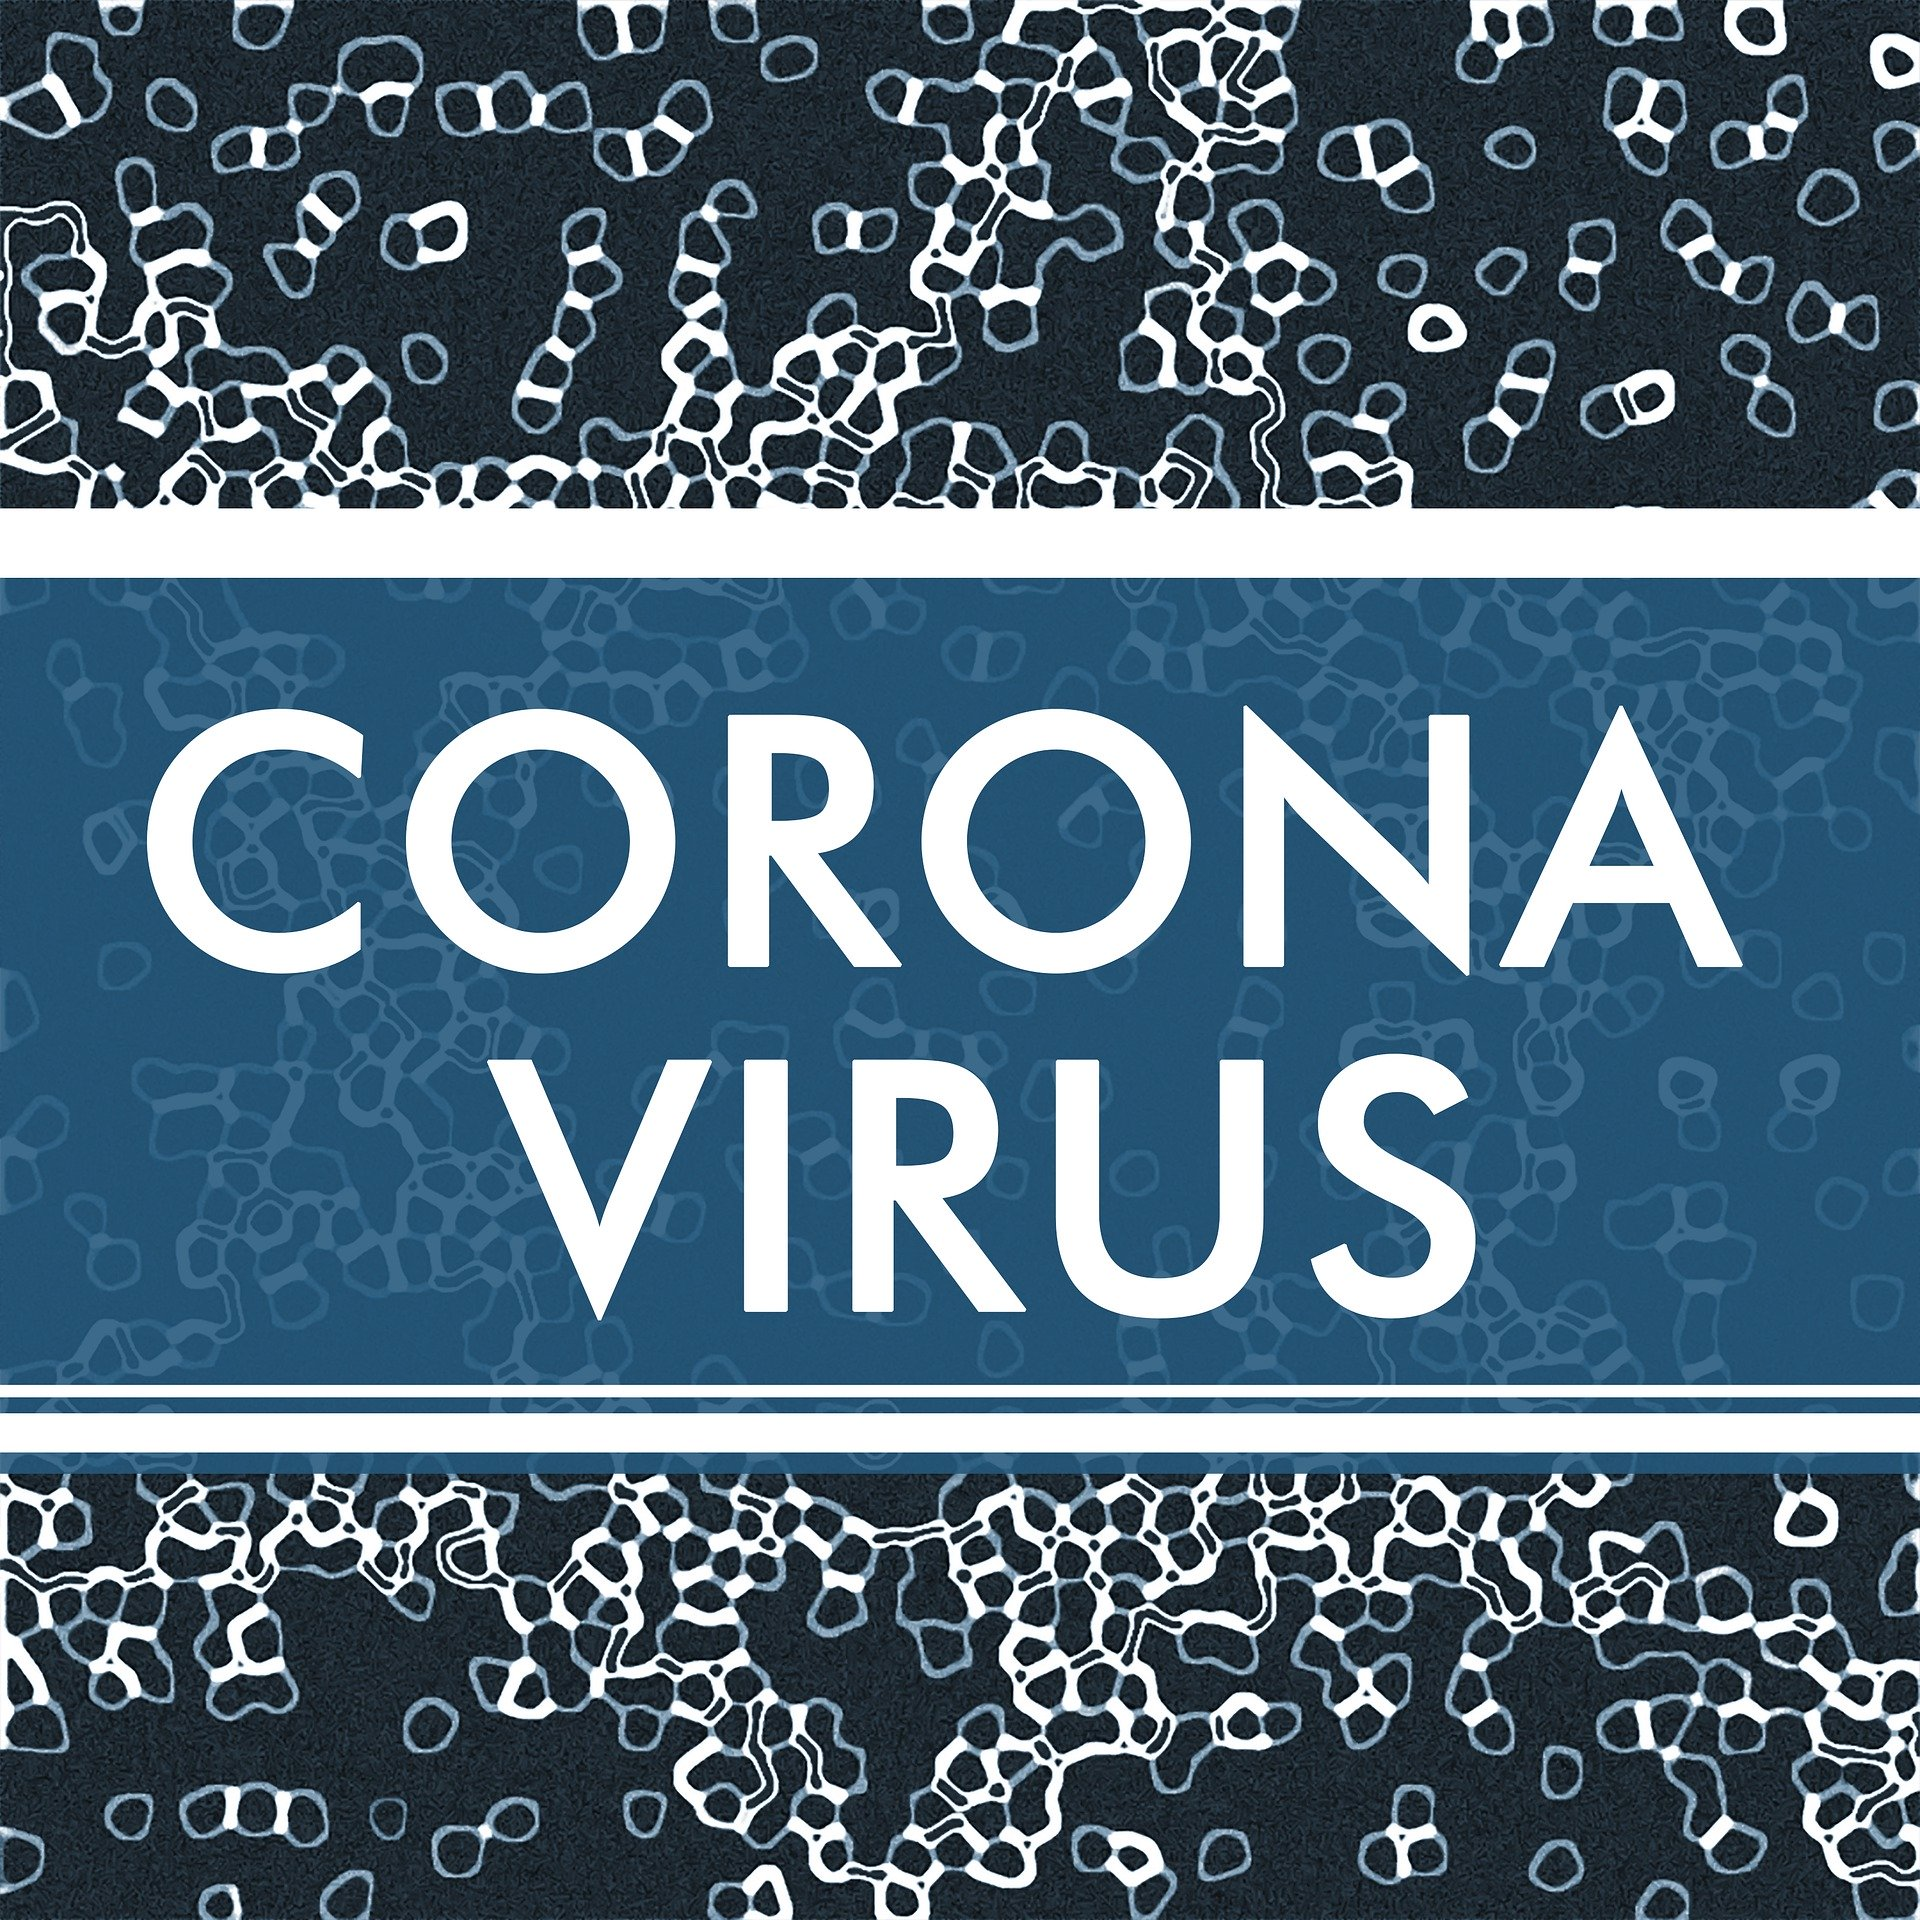 Corona-Virus und Trauerfeiern